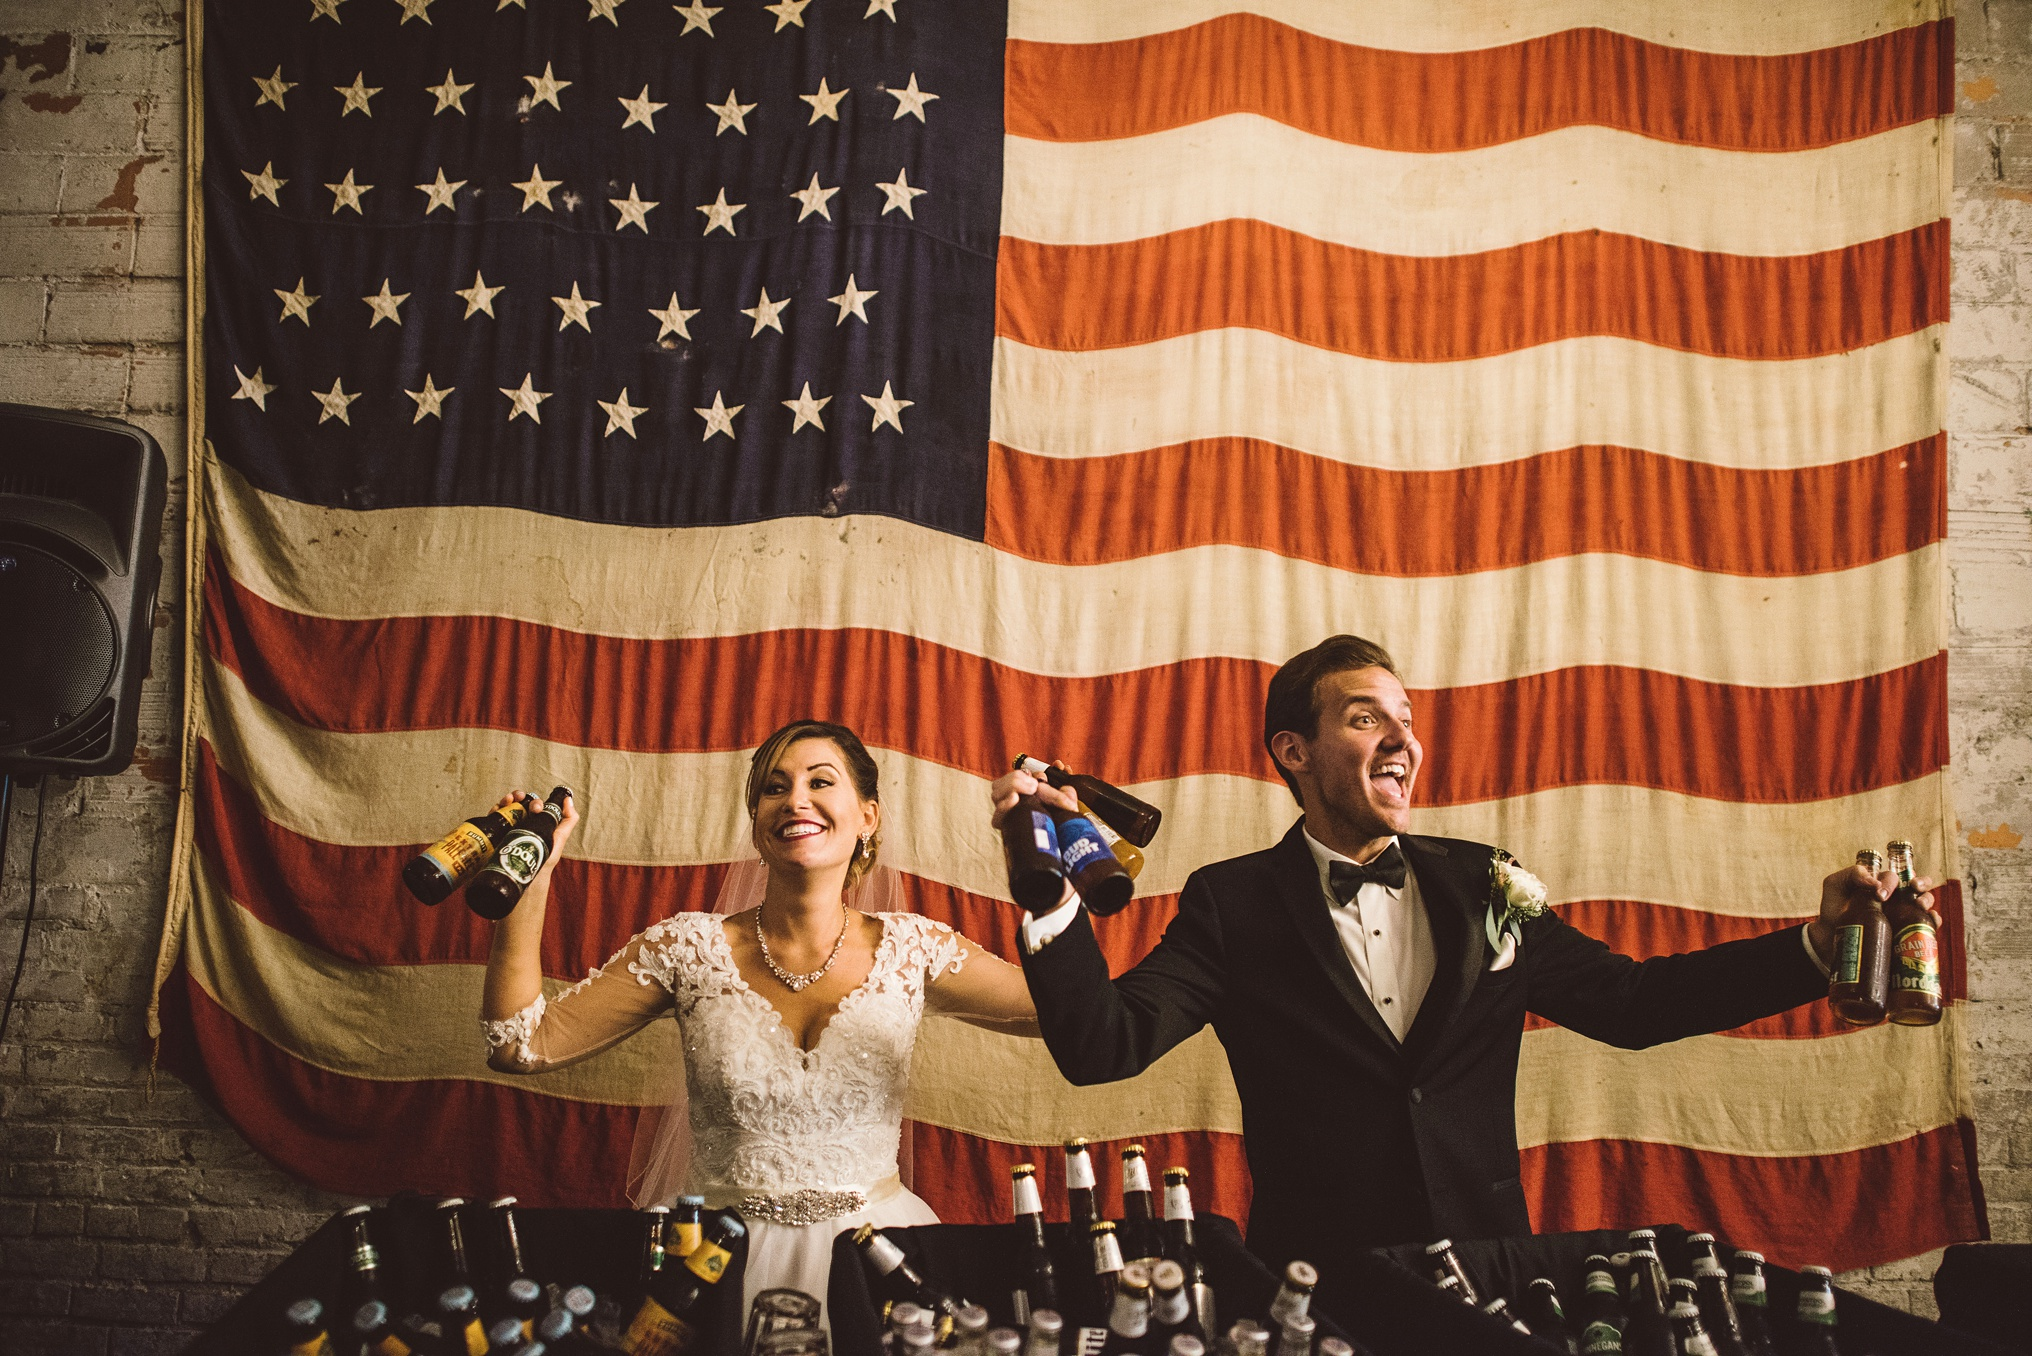 best_wedding_photography_2017_by_lucas_botz_photography_007.jpg